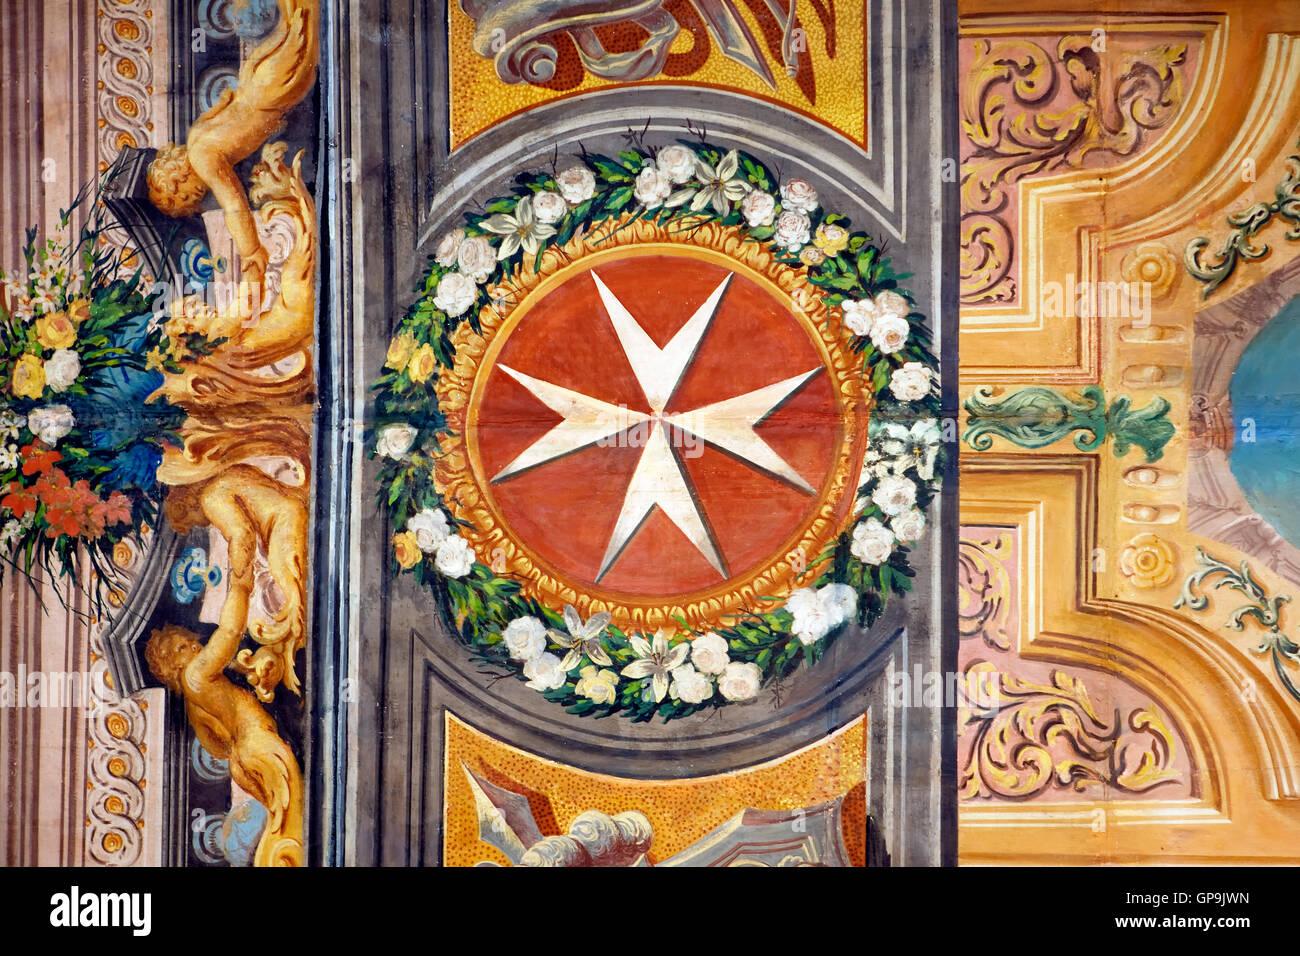 Grand Master's Palace in Valletta, Malta - Stock Image